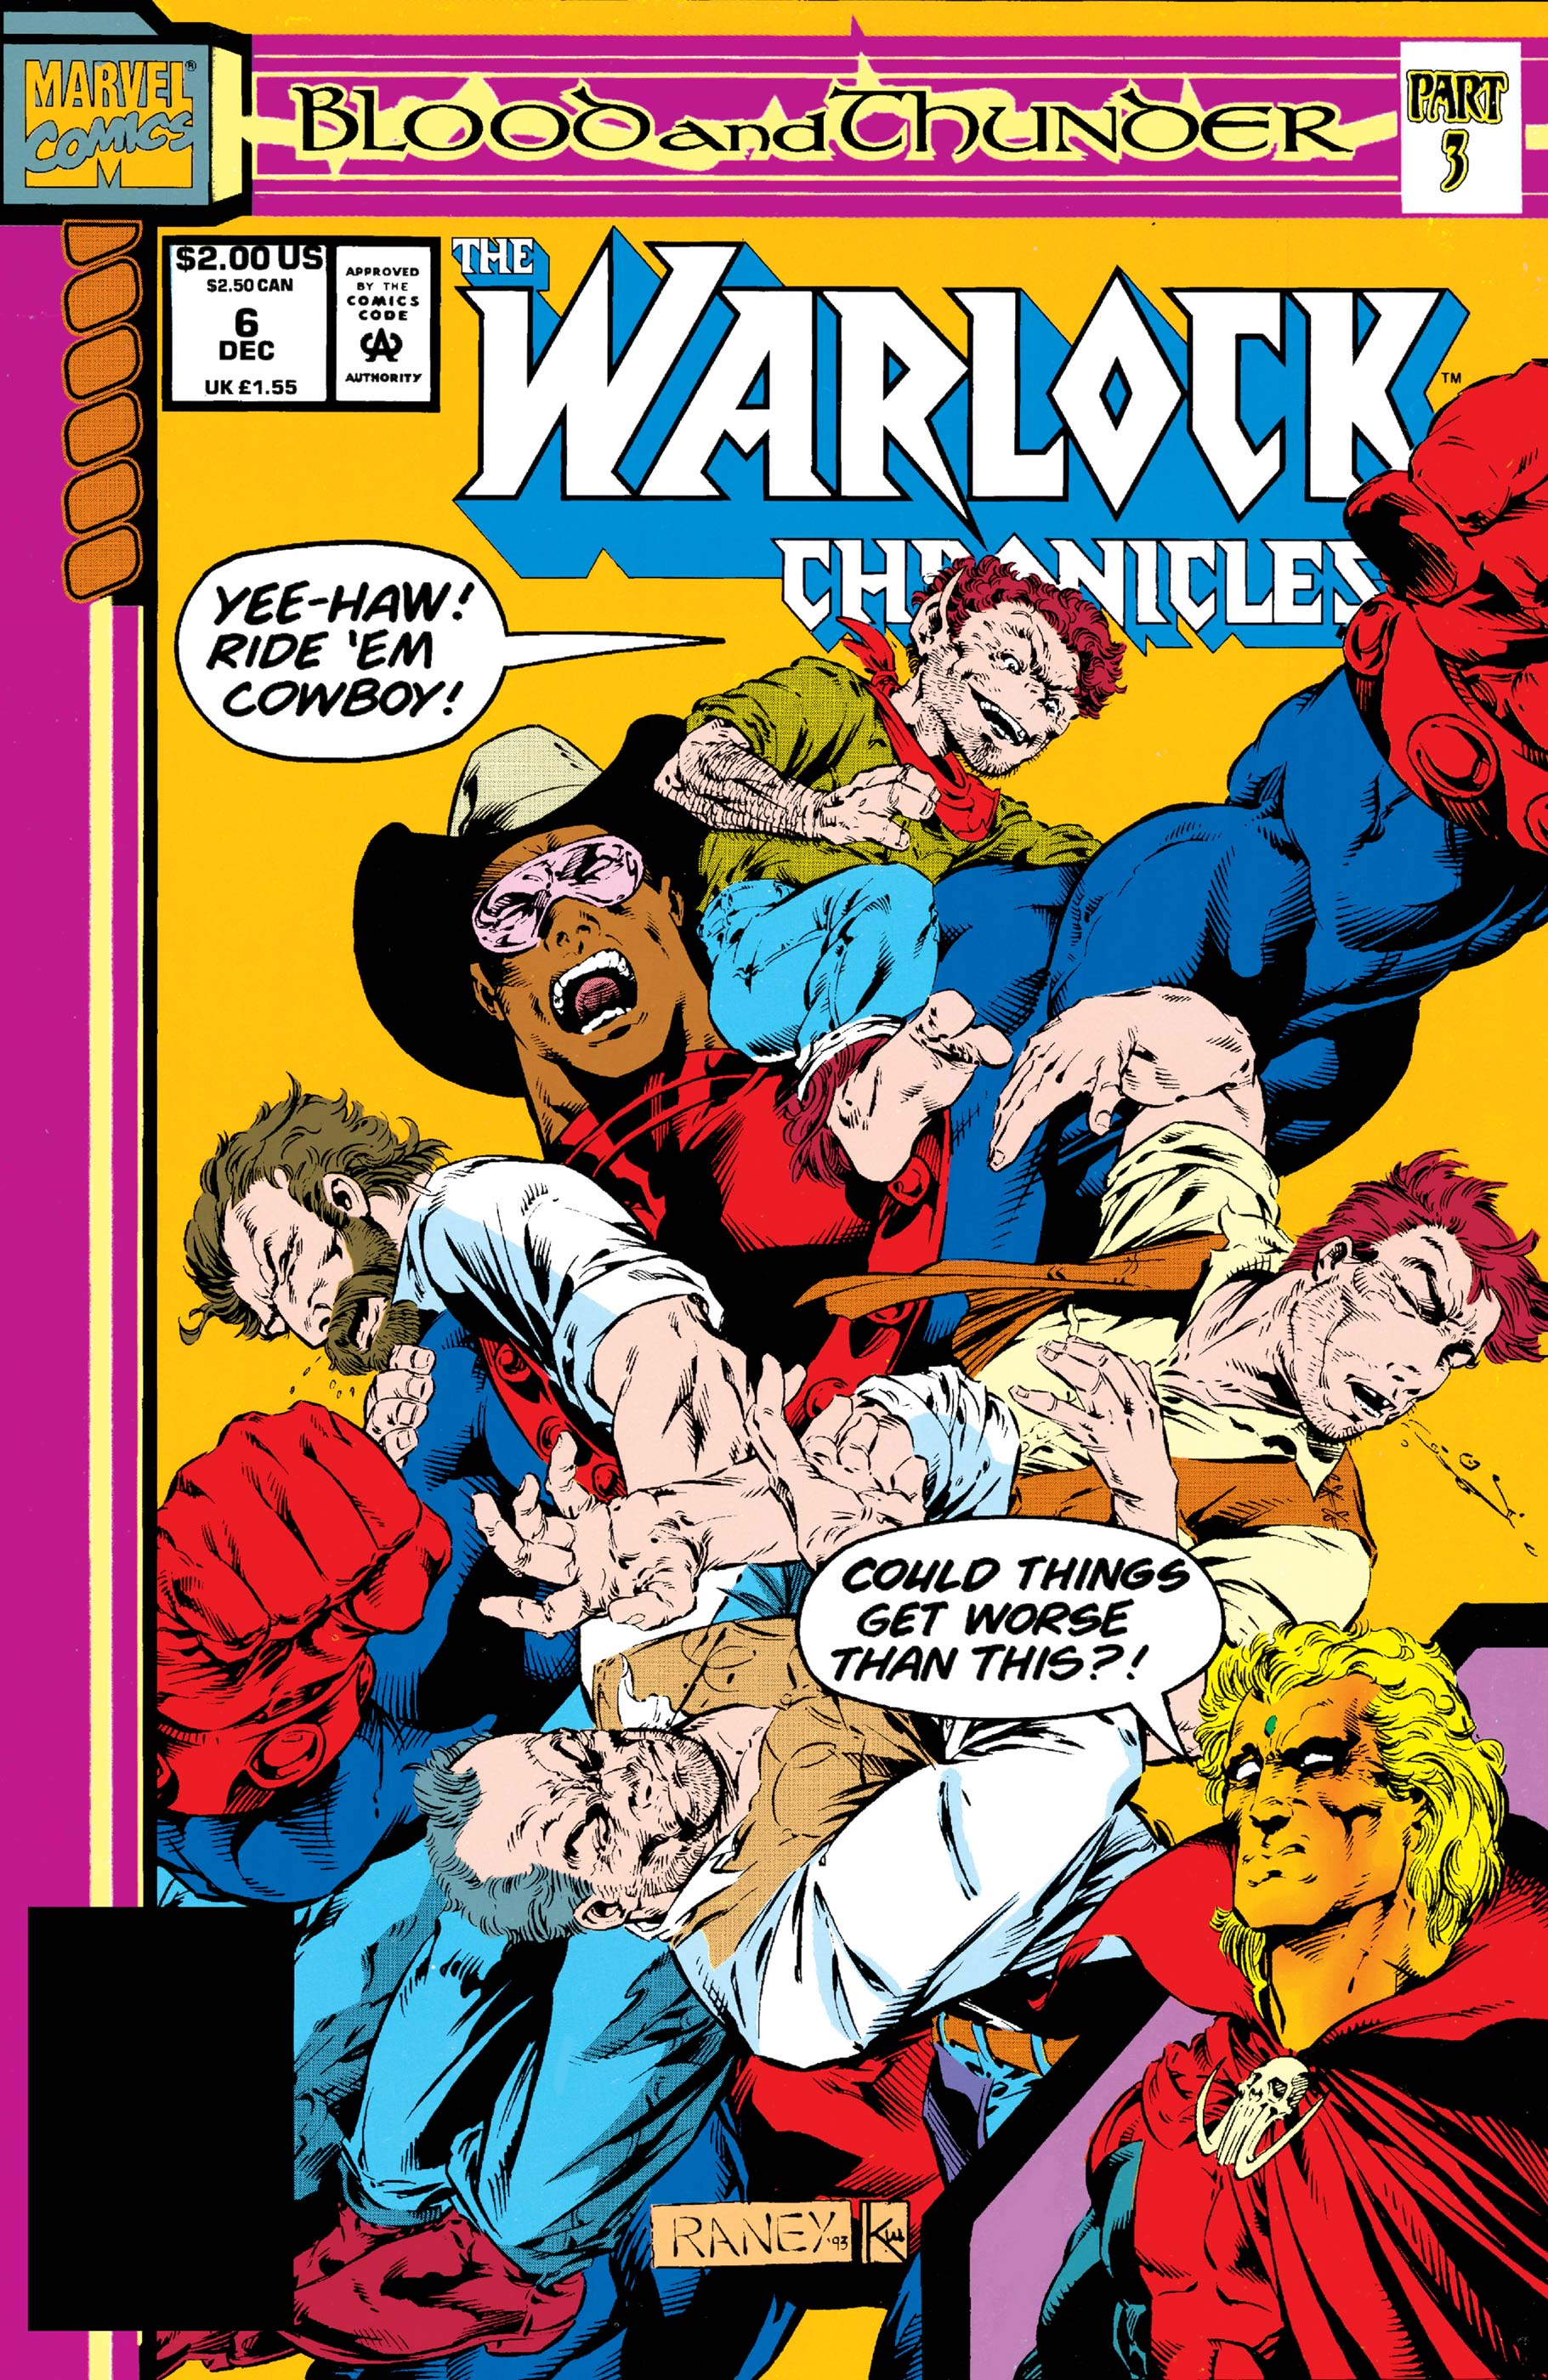 Warlock Chronicles (1993) #6